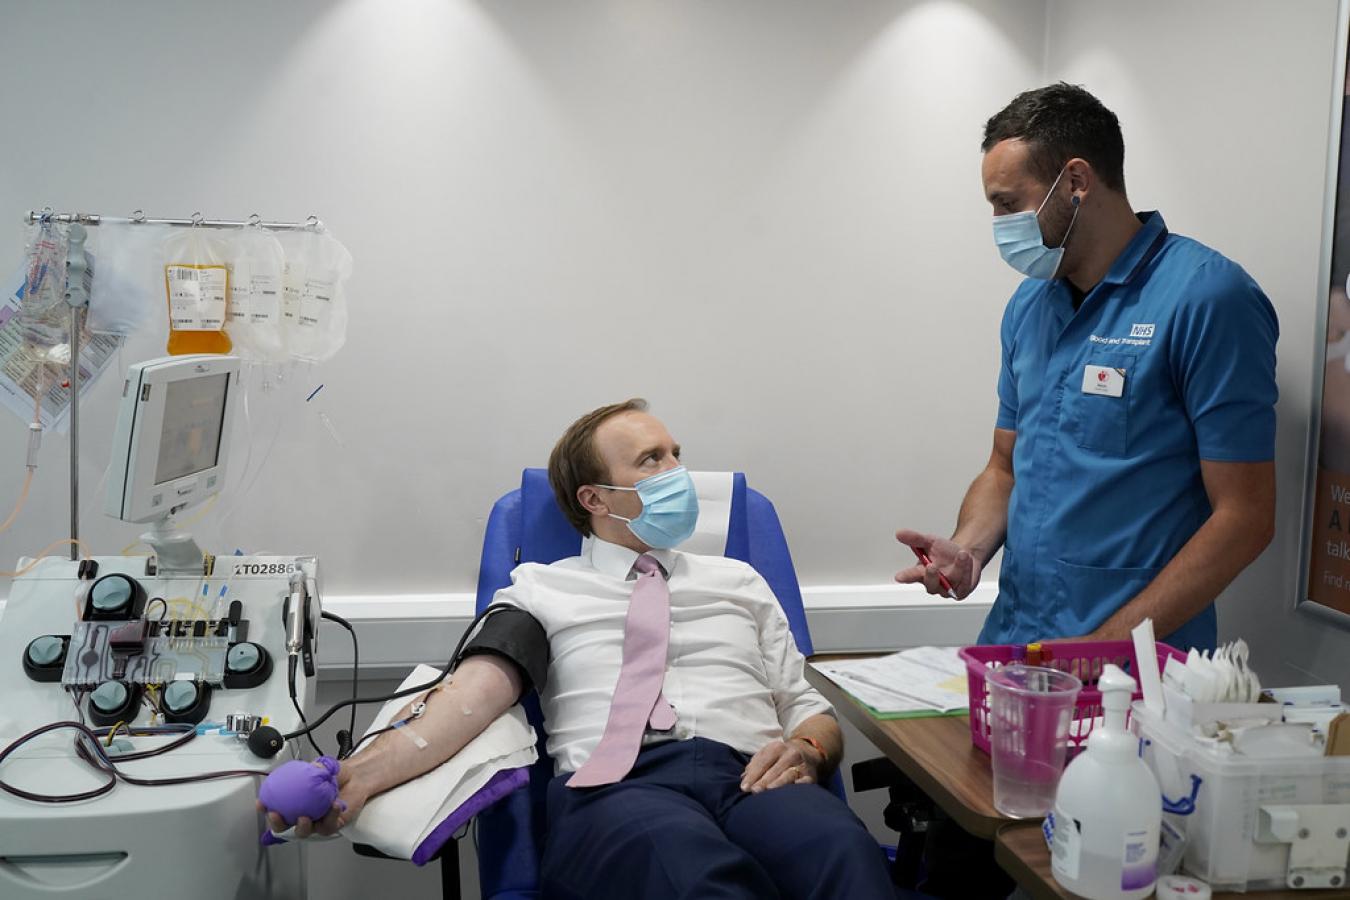 Matt Hancock UK Health Secretary donates Covid-19 Antibodies 5 June 2020